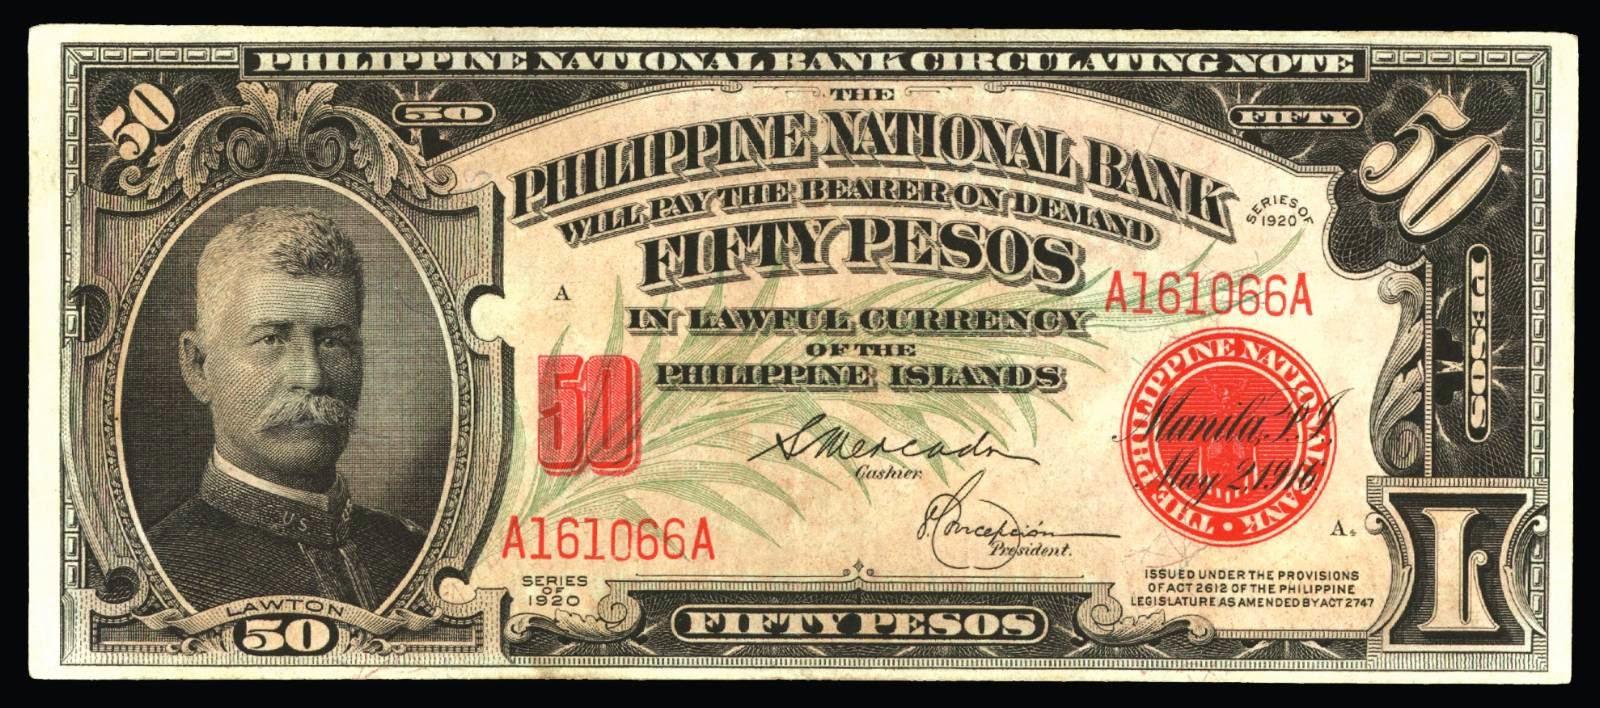 Philippines 50 Pesos Circulating Note 1920 General Lawton ...  Philippines 50 ...